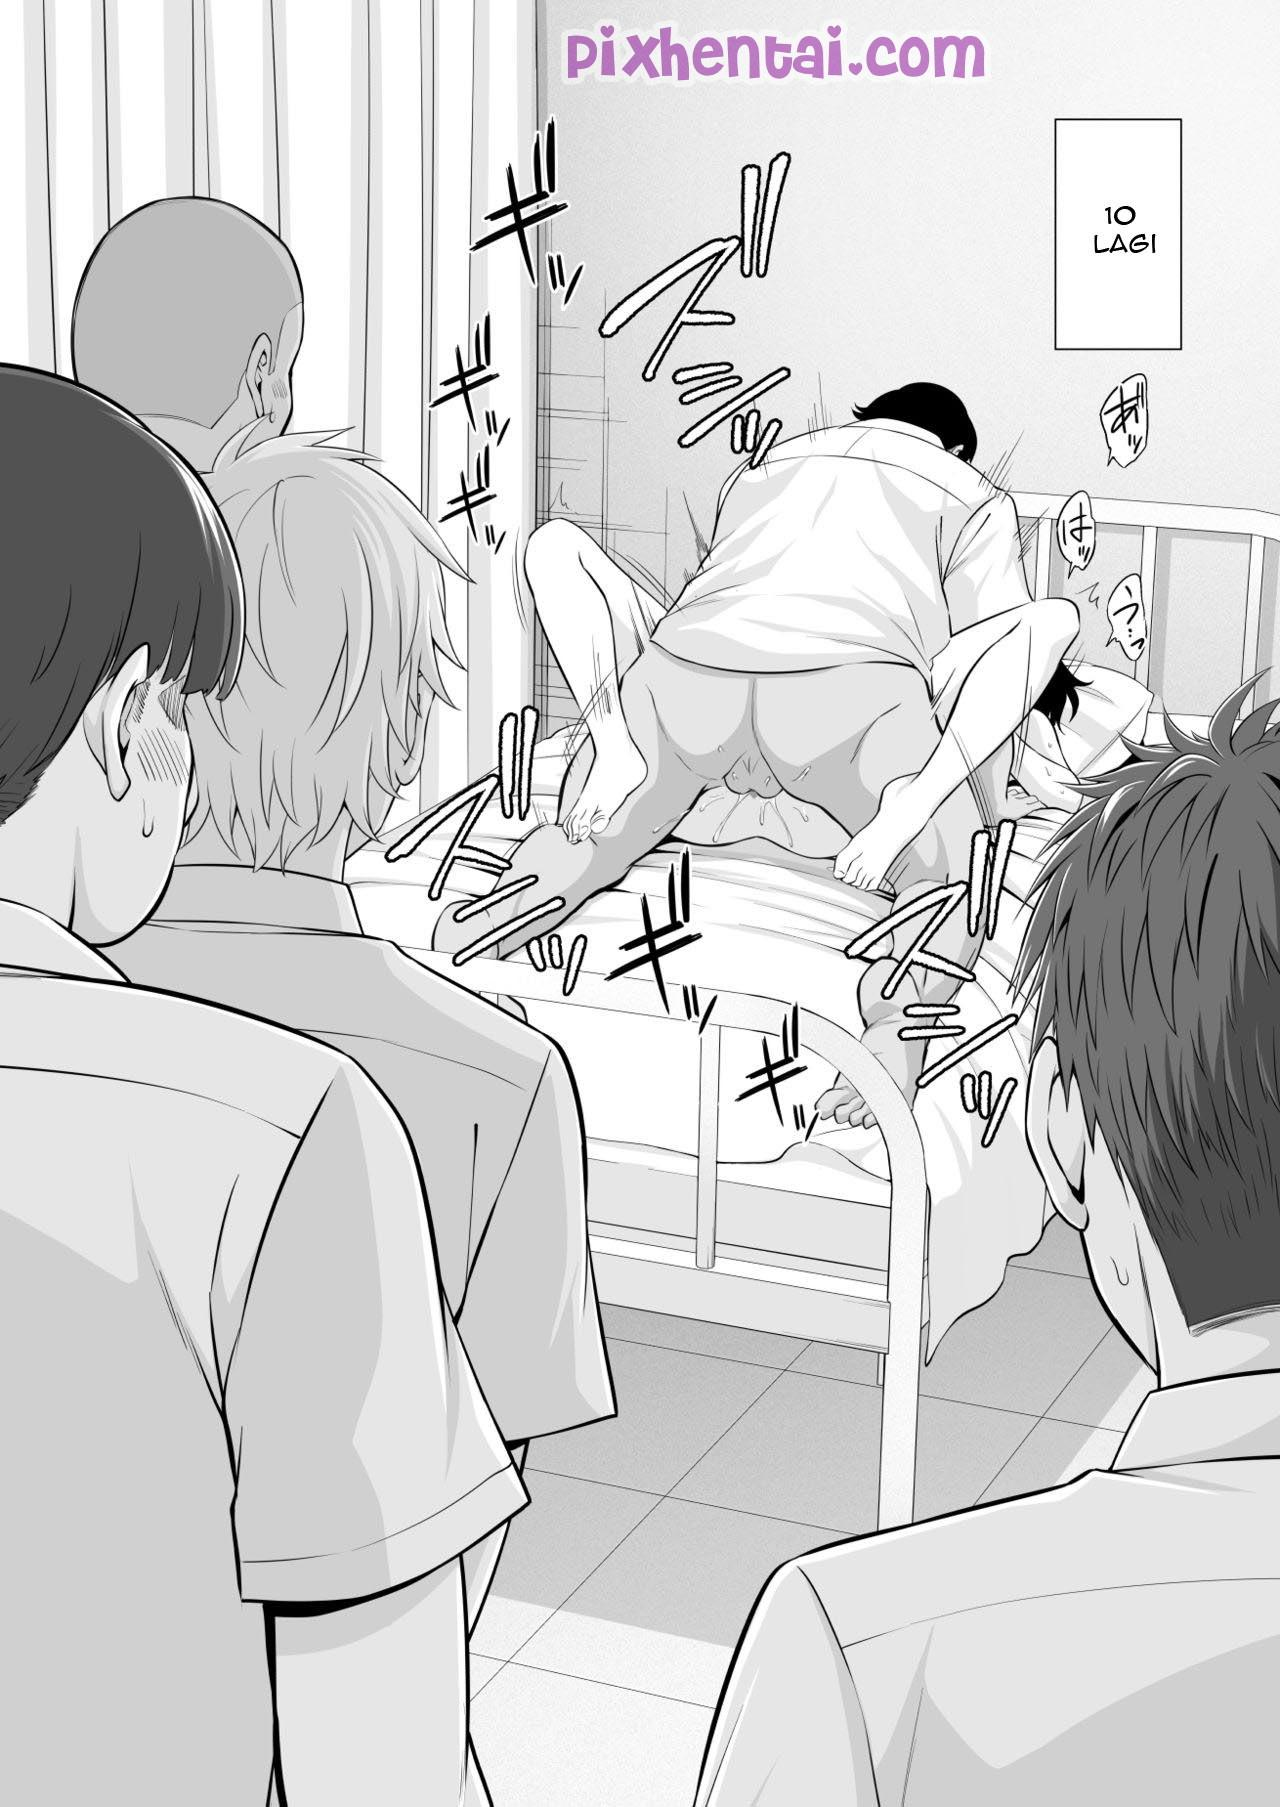 Komik hentai xxx manga sex bokep siswi dientot bergiliran demi beasiswa 36